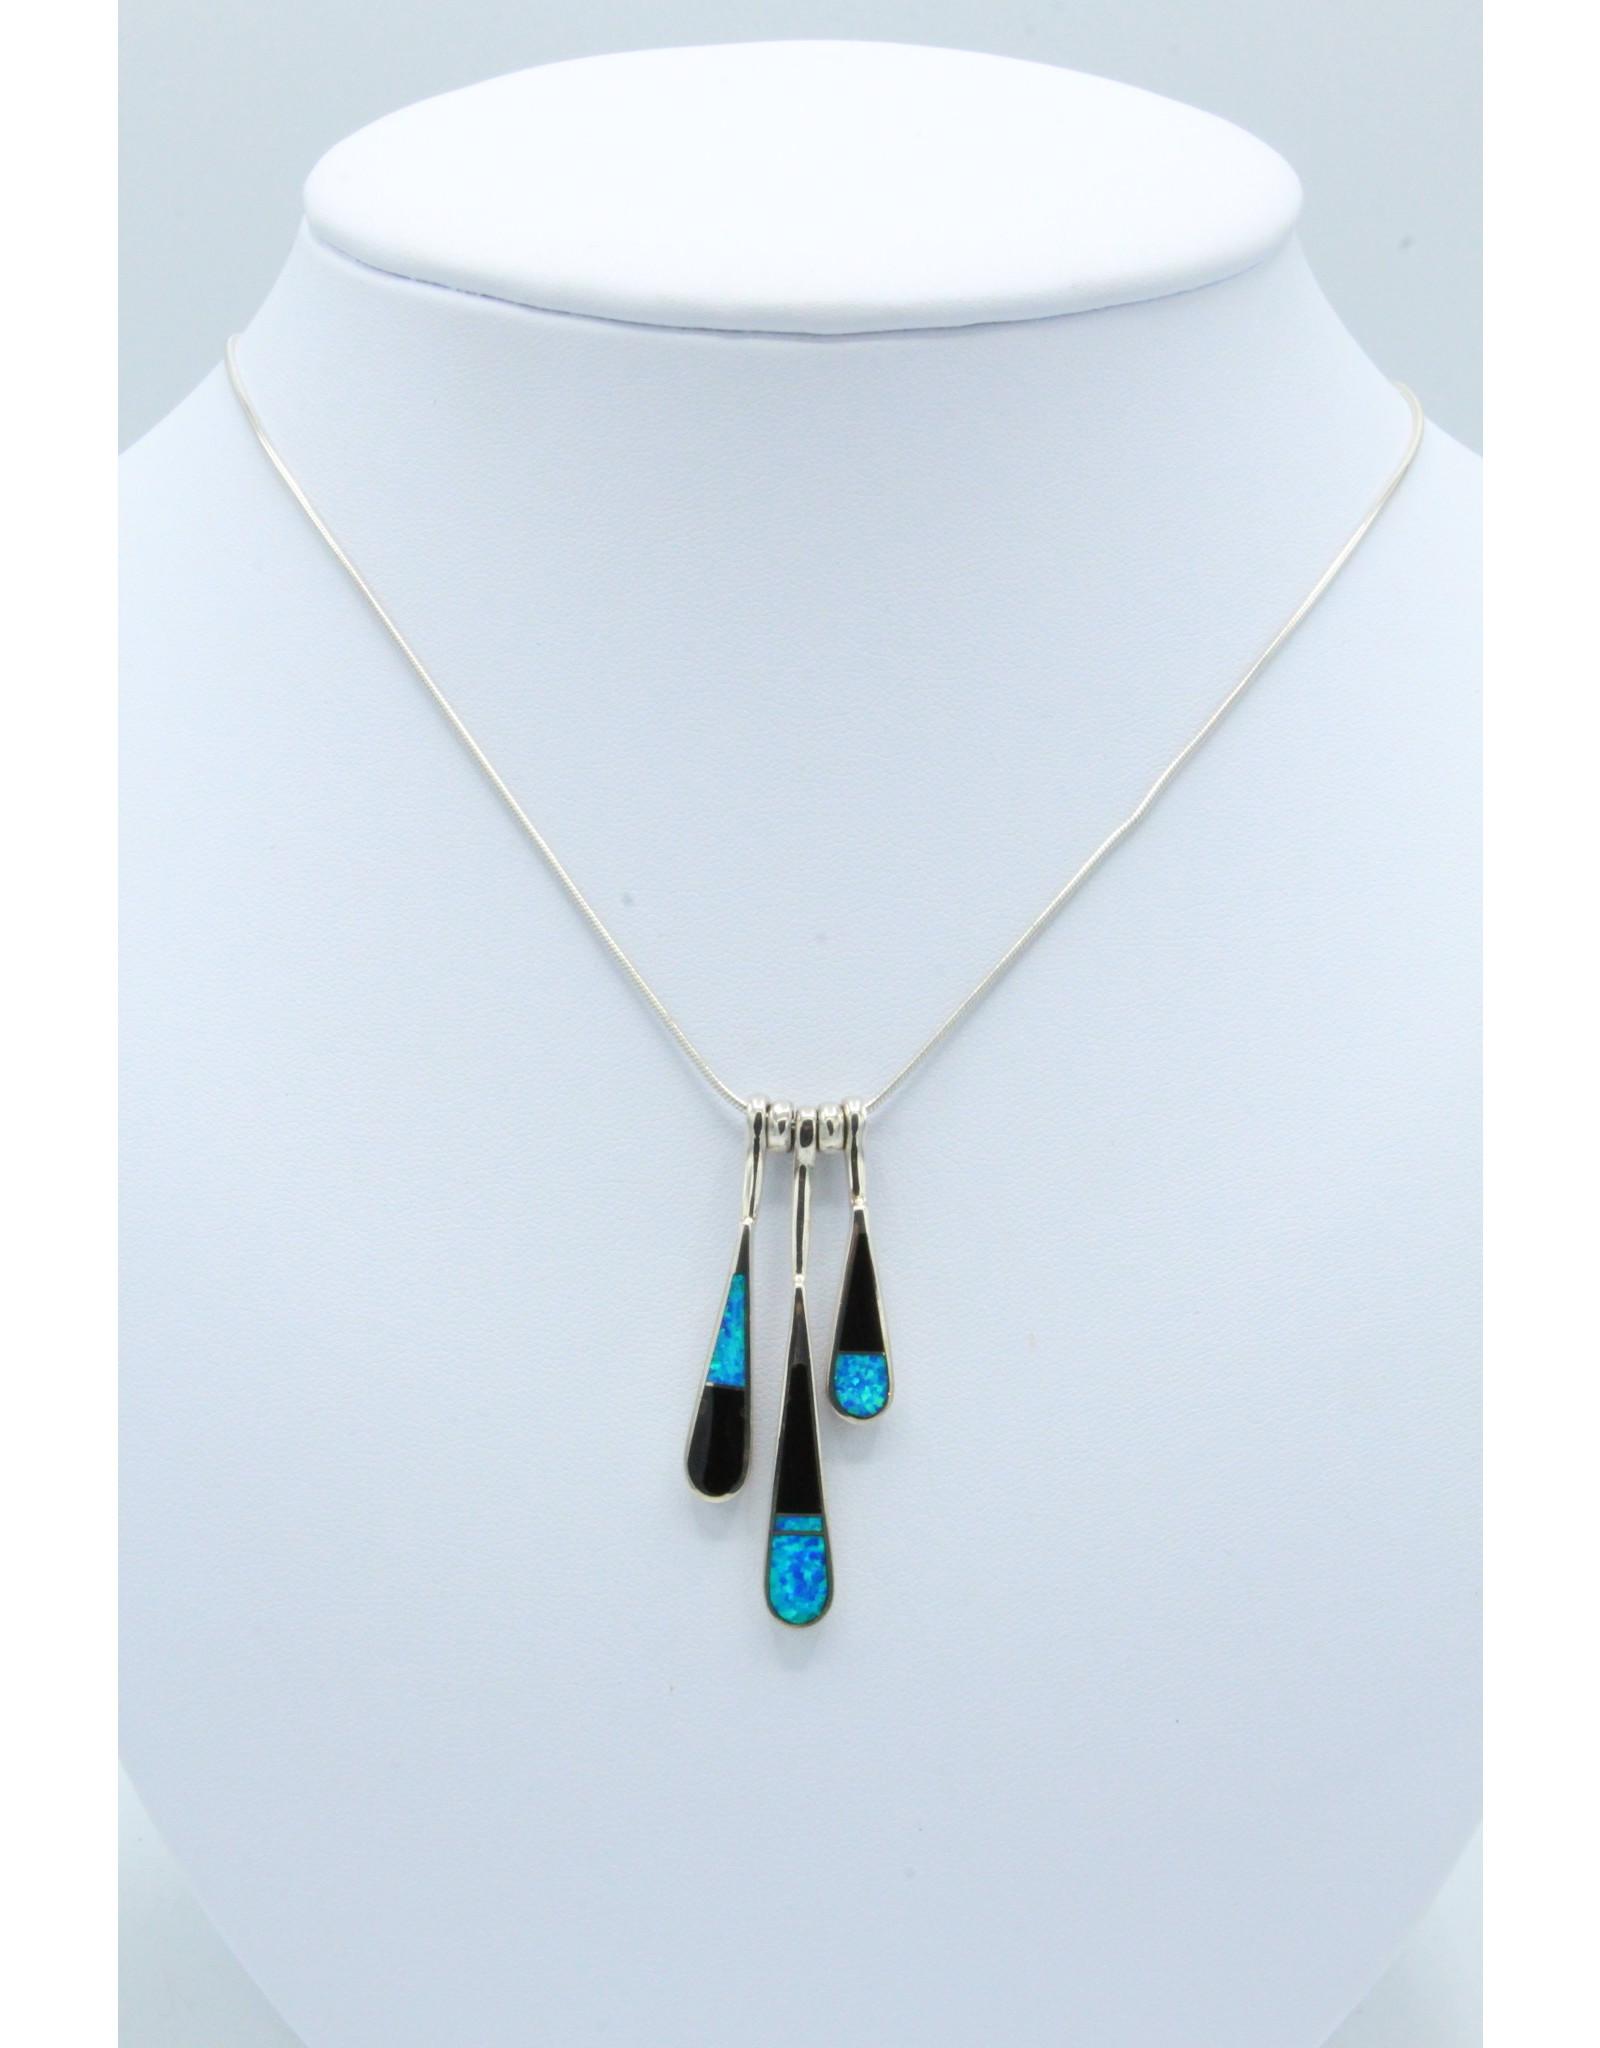 3 Tear Necklace - N-108-41